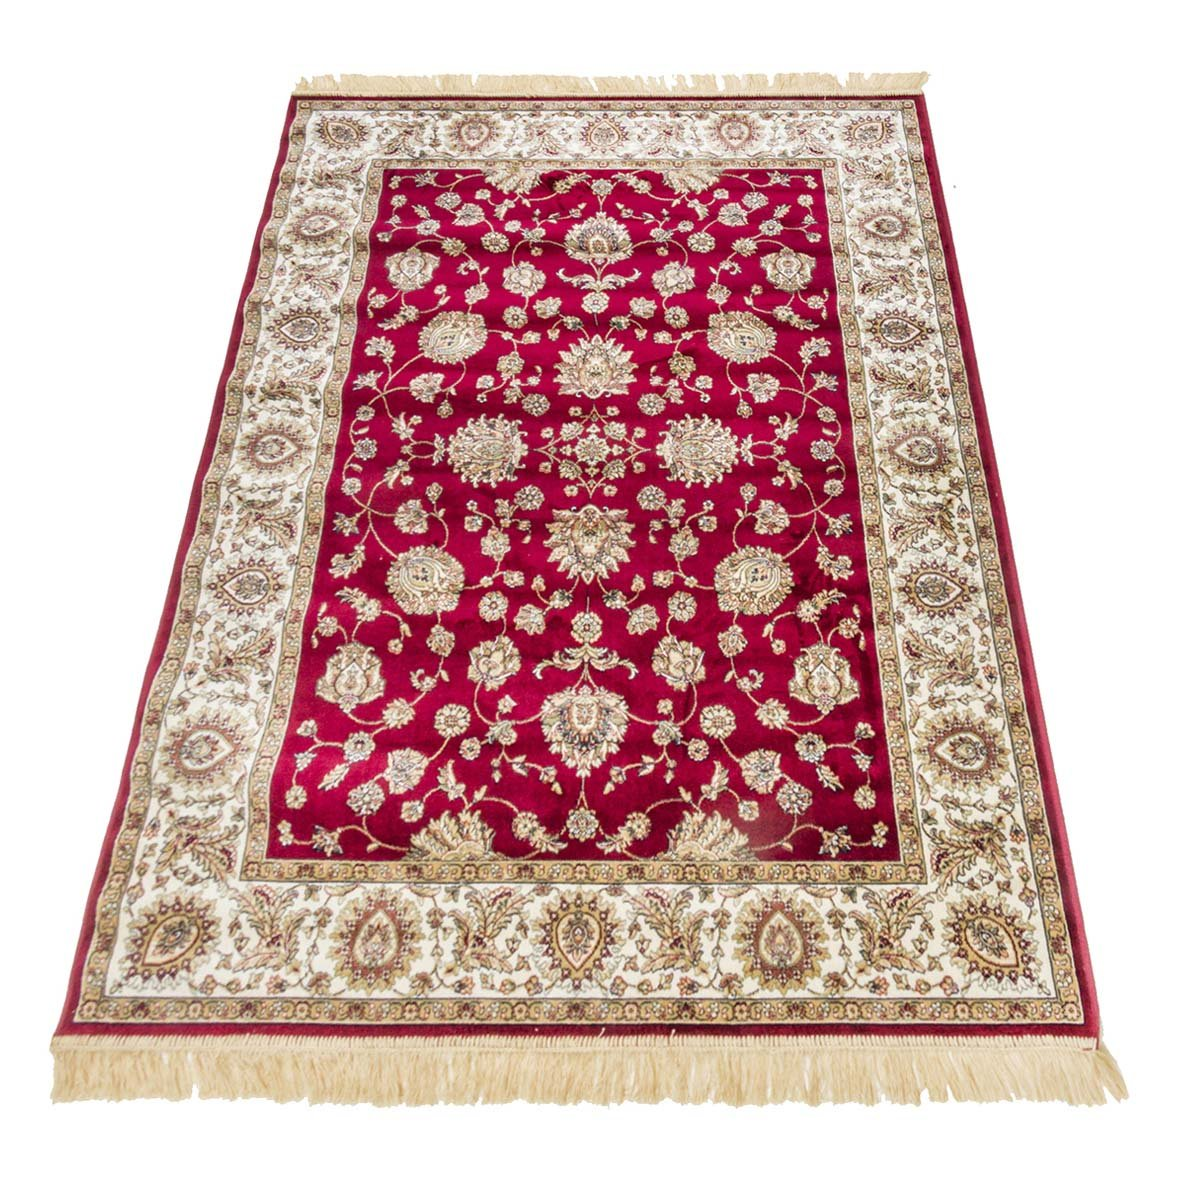 WEBTAPPETI Teppich Oriental Klassisches Sarouk RUBINE 492-rosso cm.200x290 rot